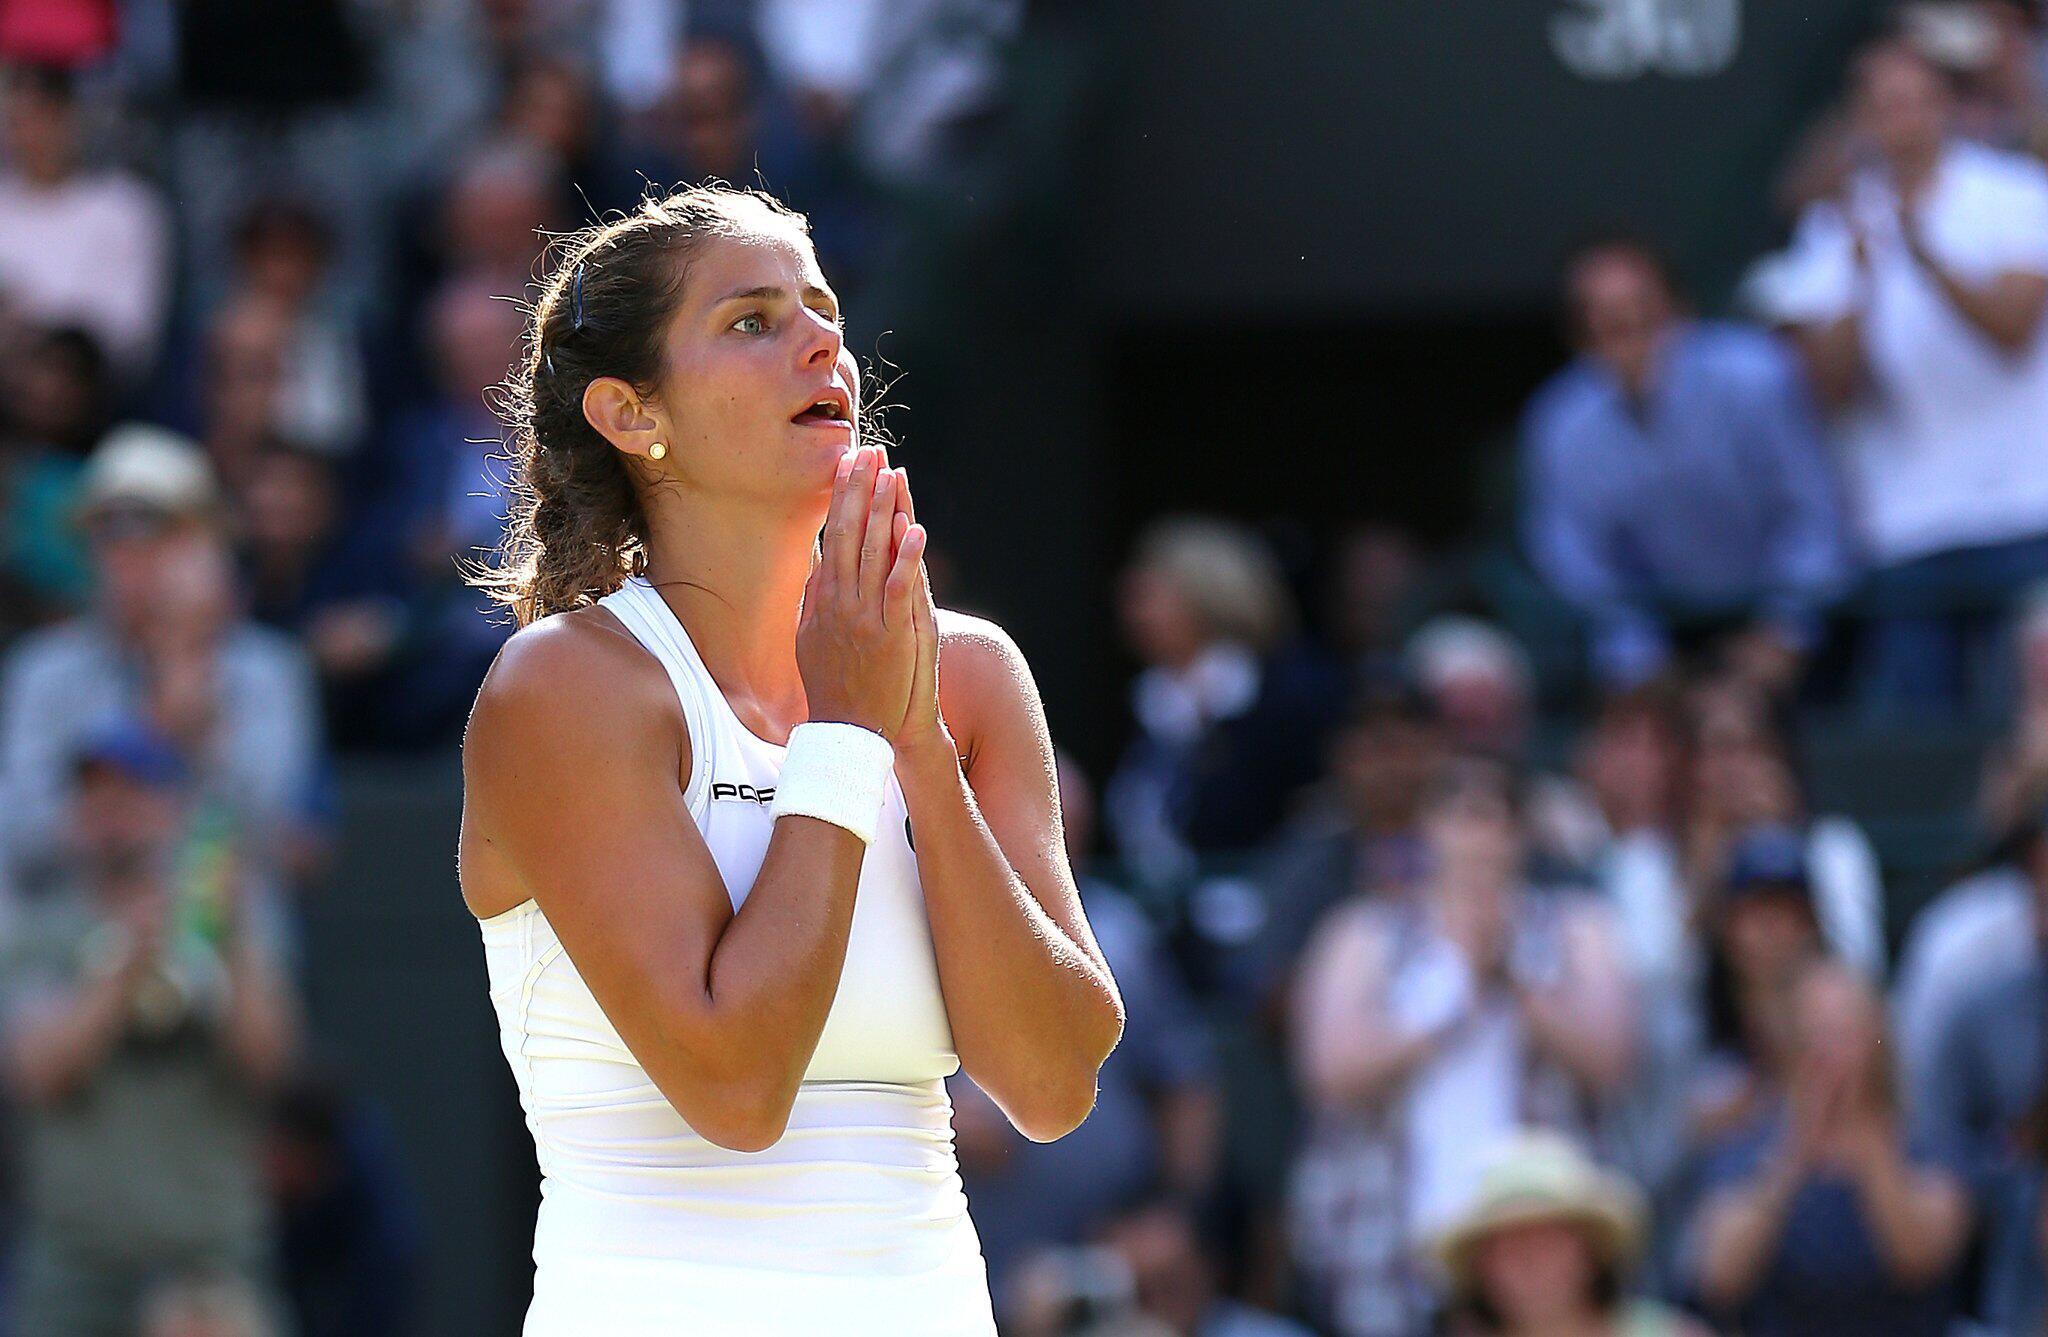 Bild zu Wimbledon, Julia Görges, Viertelfinale, Kiki Bertens